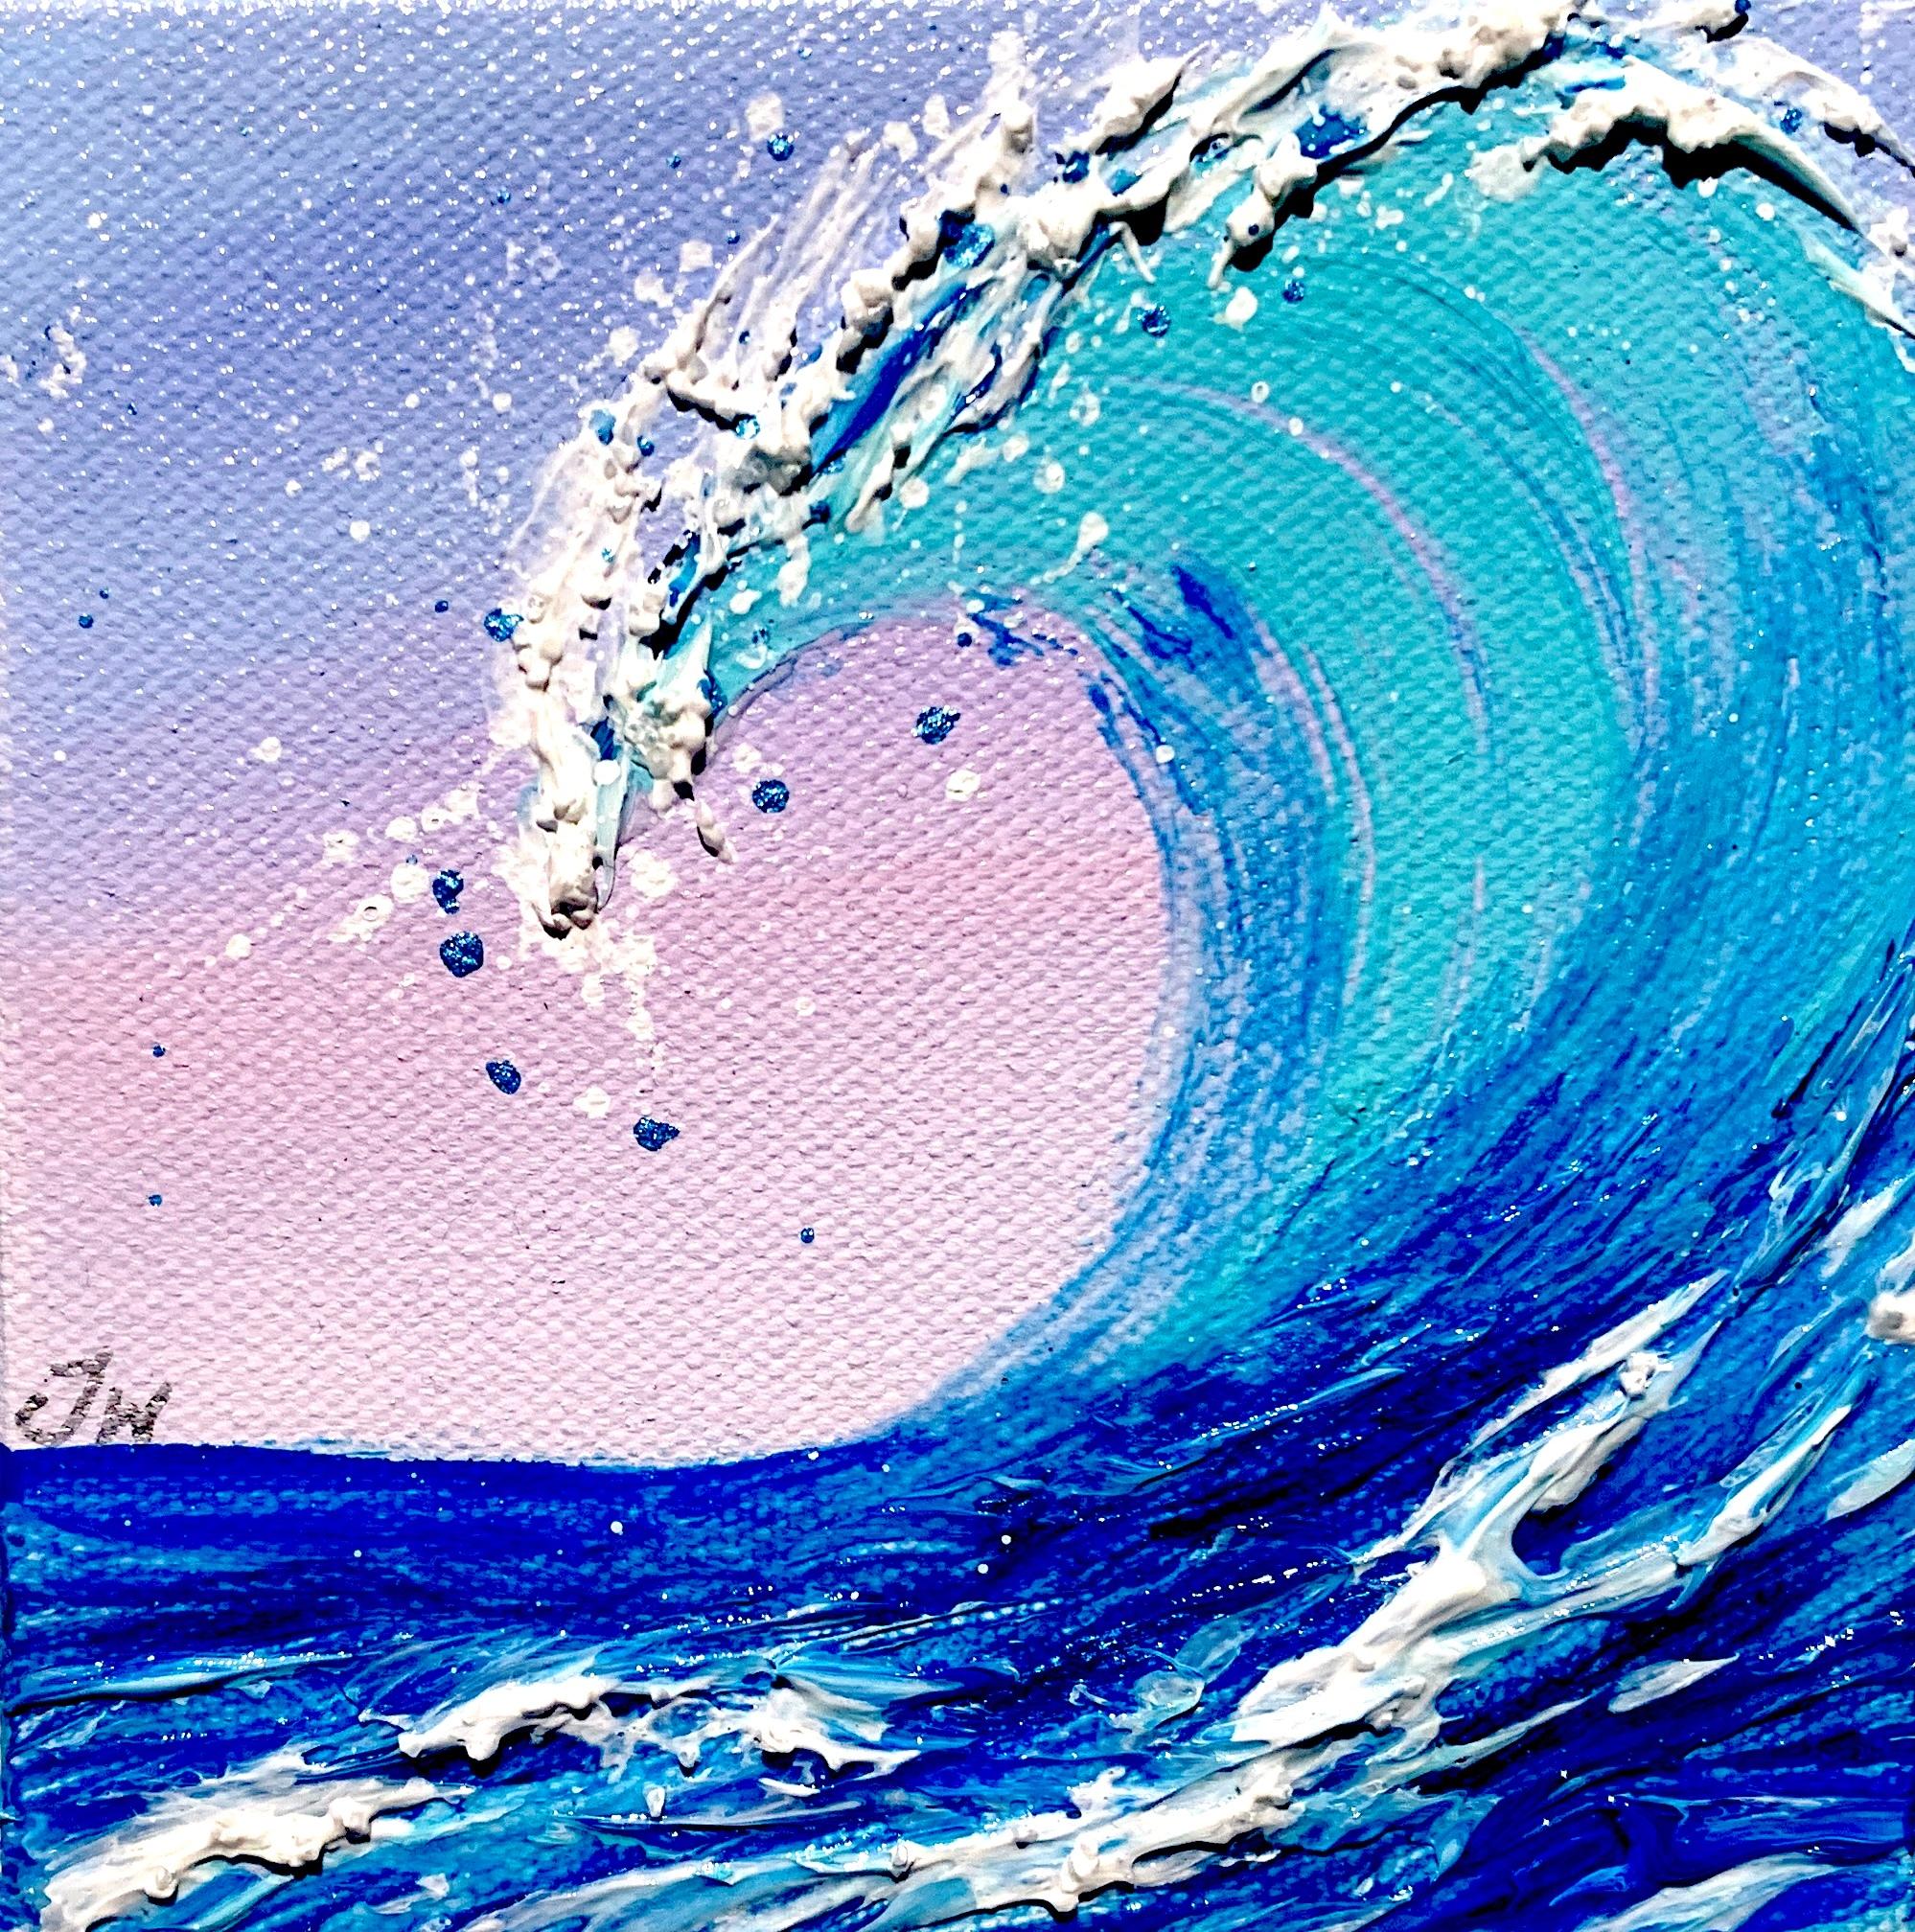 Jenna wellein   sunrise waves drop of ocean   marine debris clean ocean texture hawaii maui painting front street lahaina 5 dgfuk6